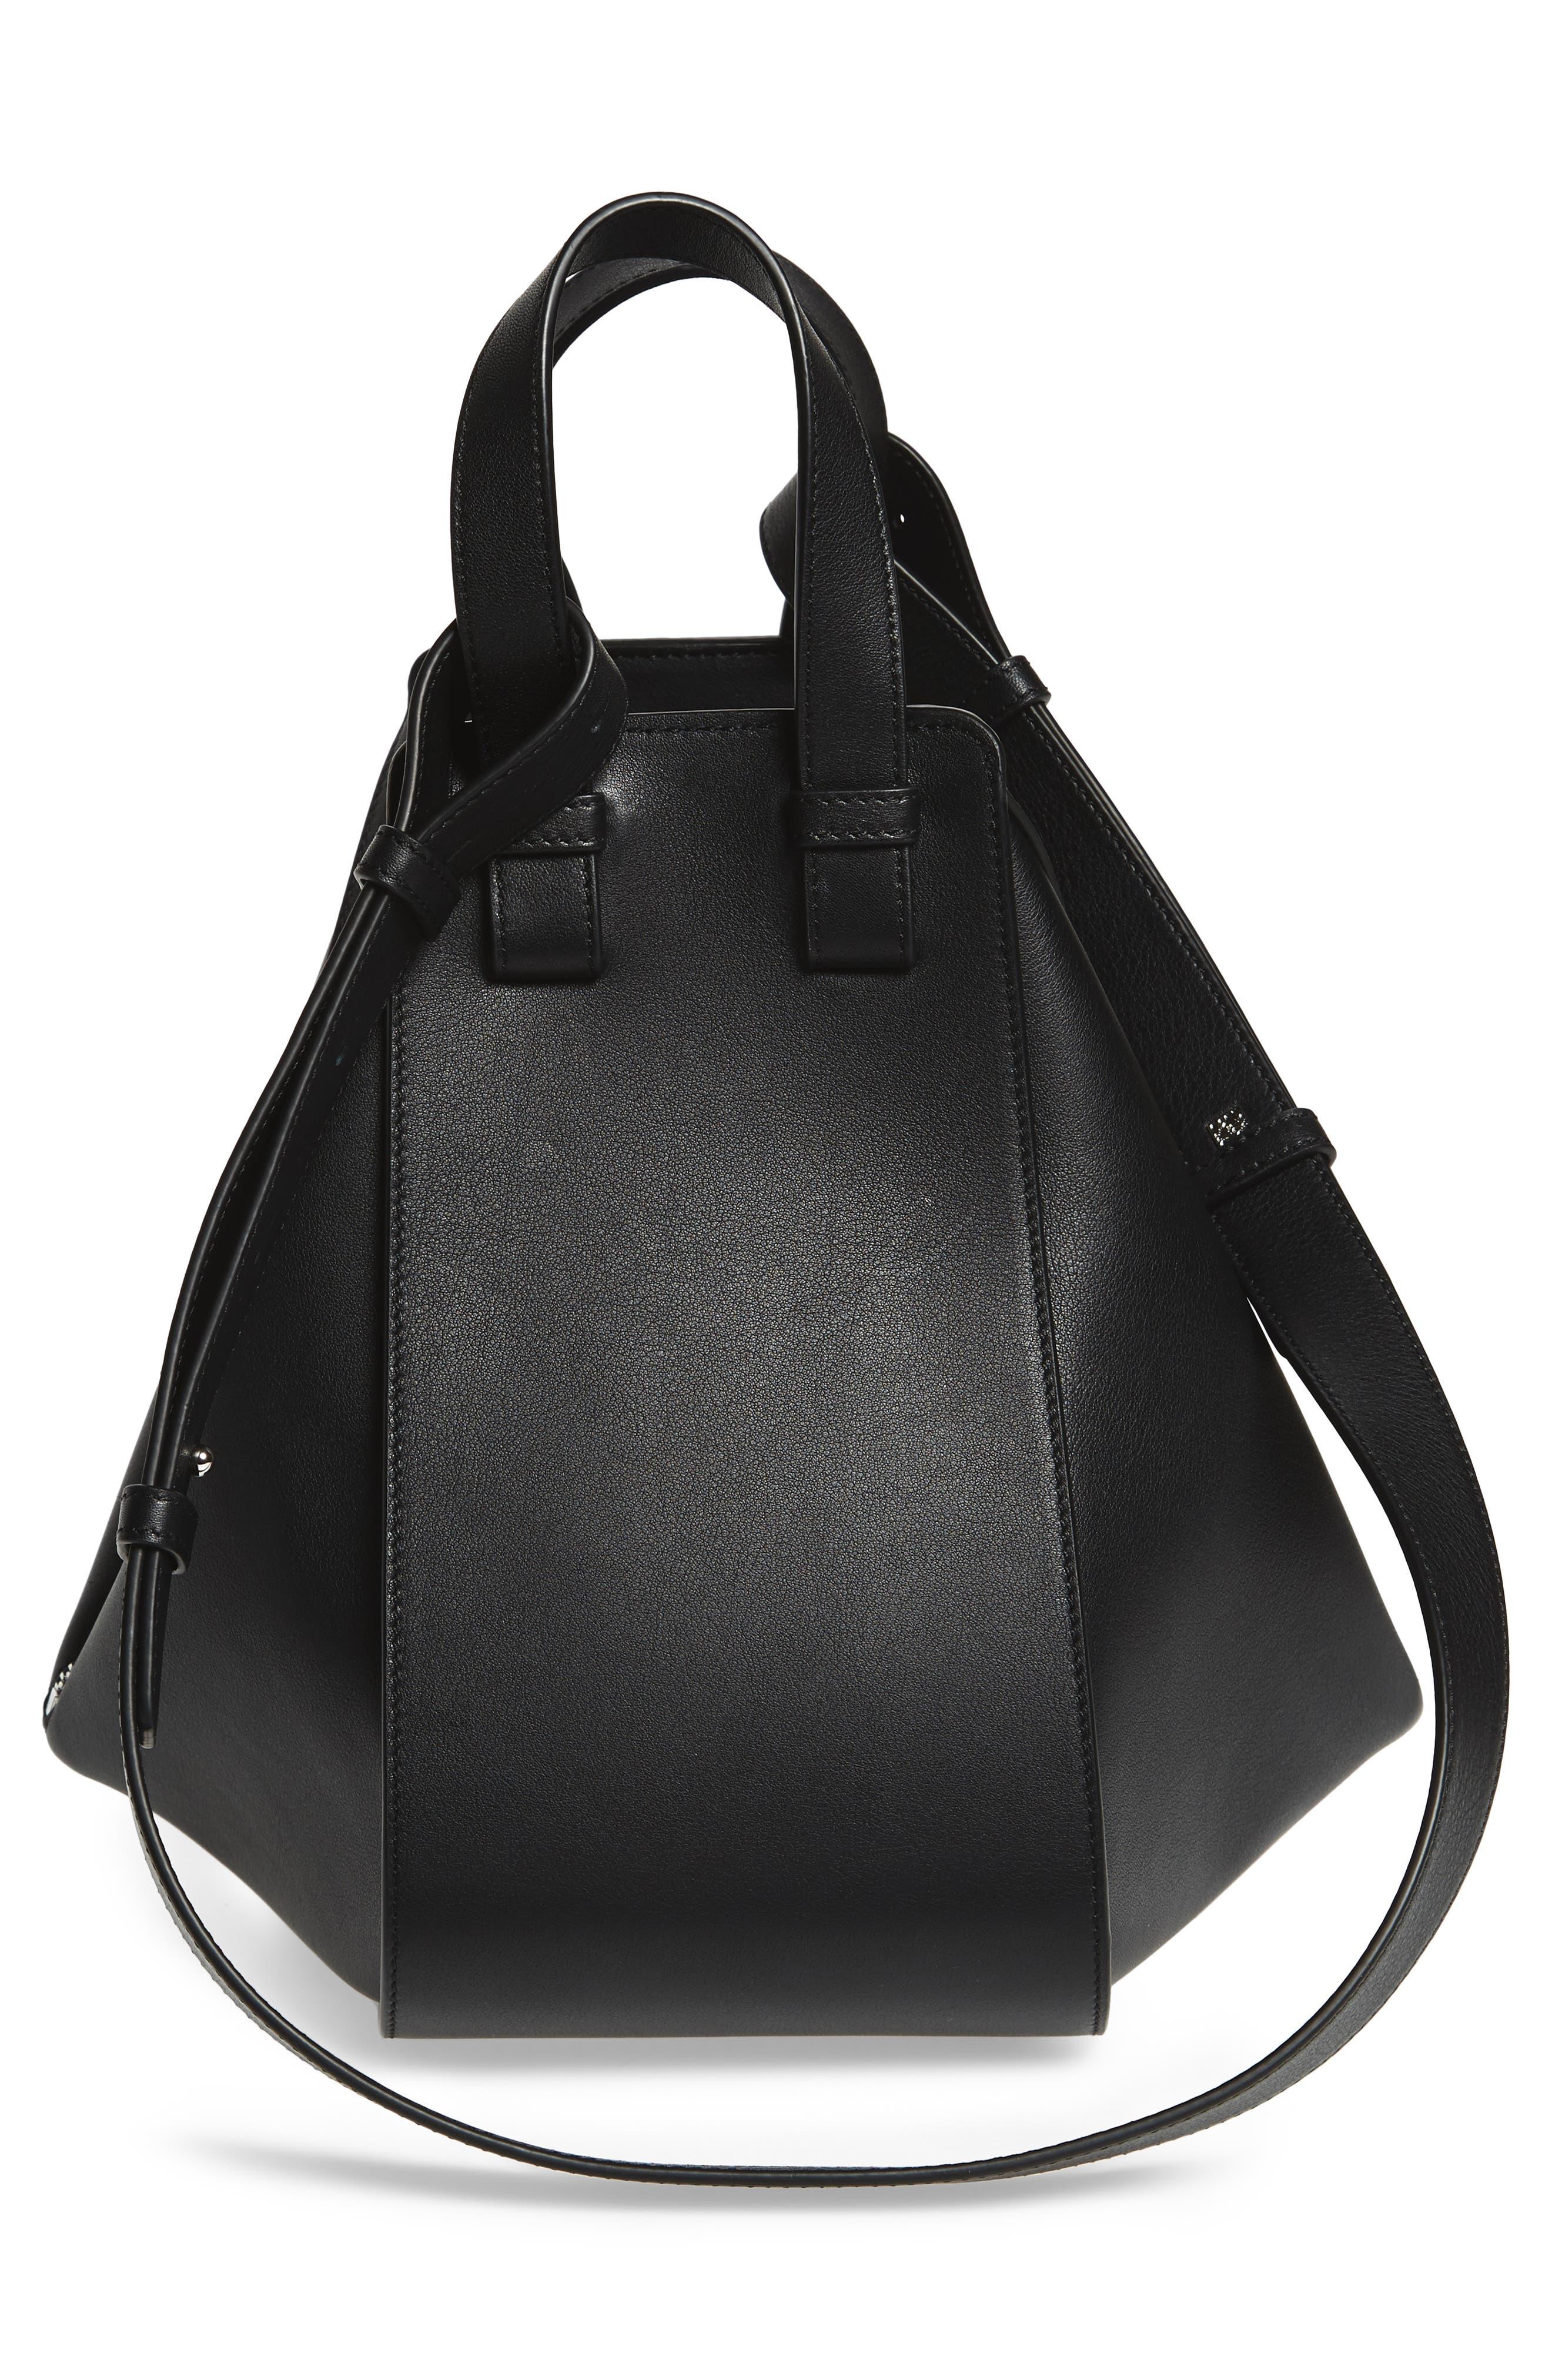 Alternate Image 3  - Loewe Small Hammock Leather Hobo